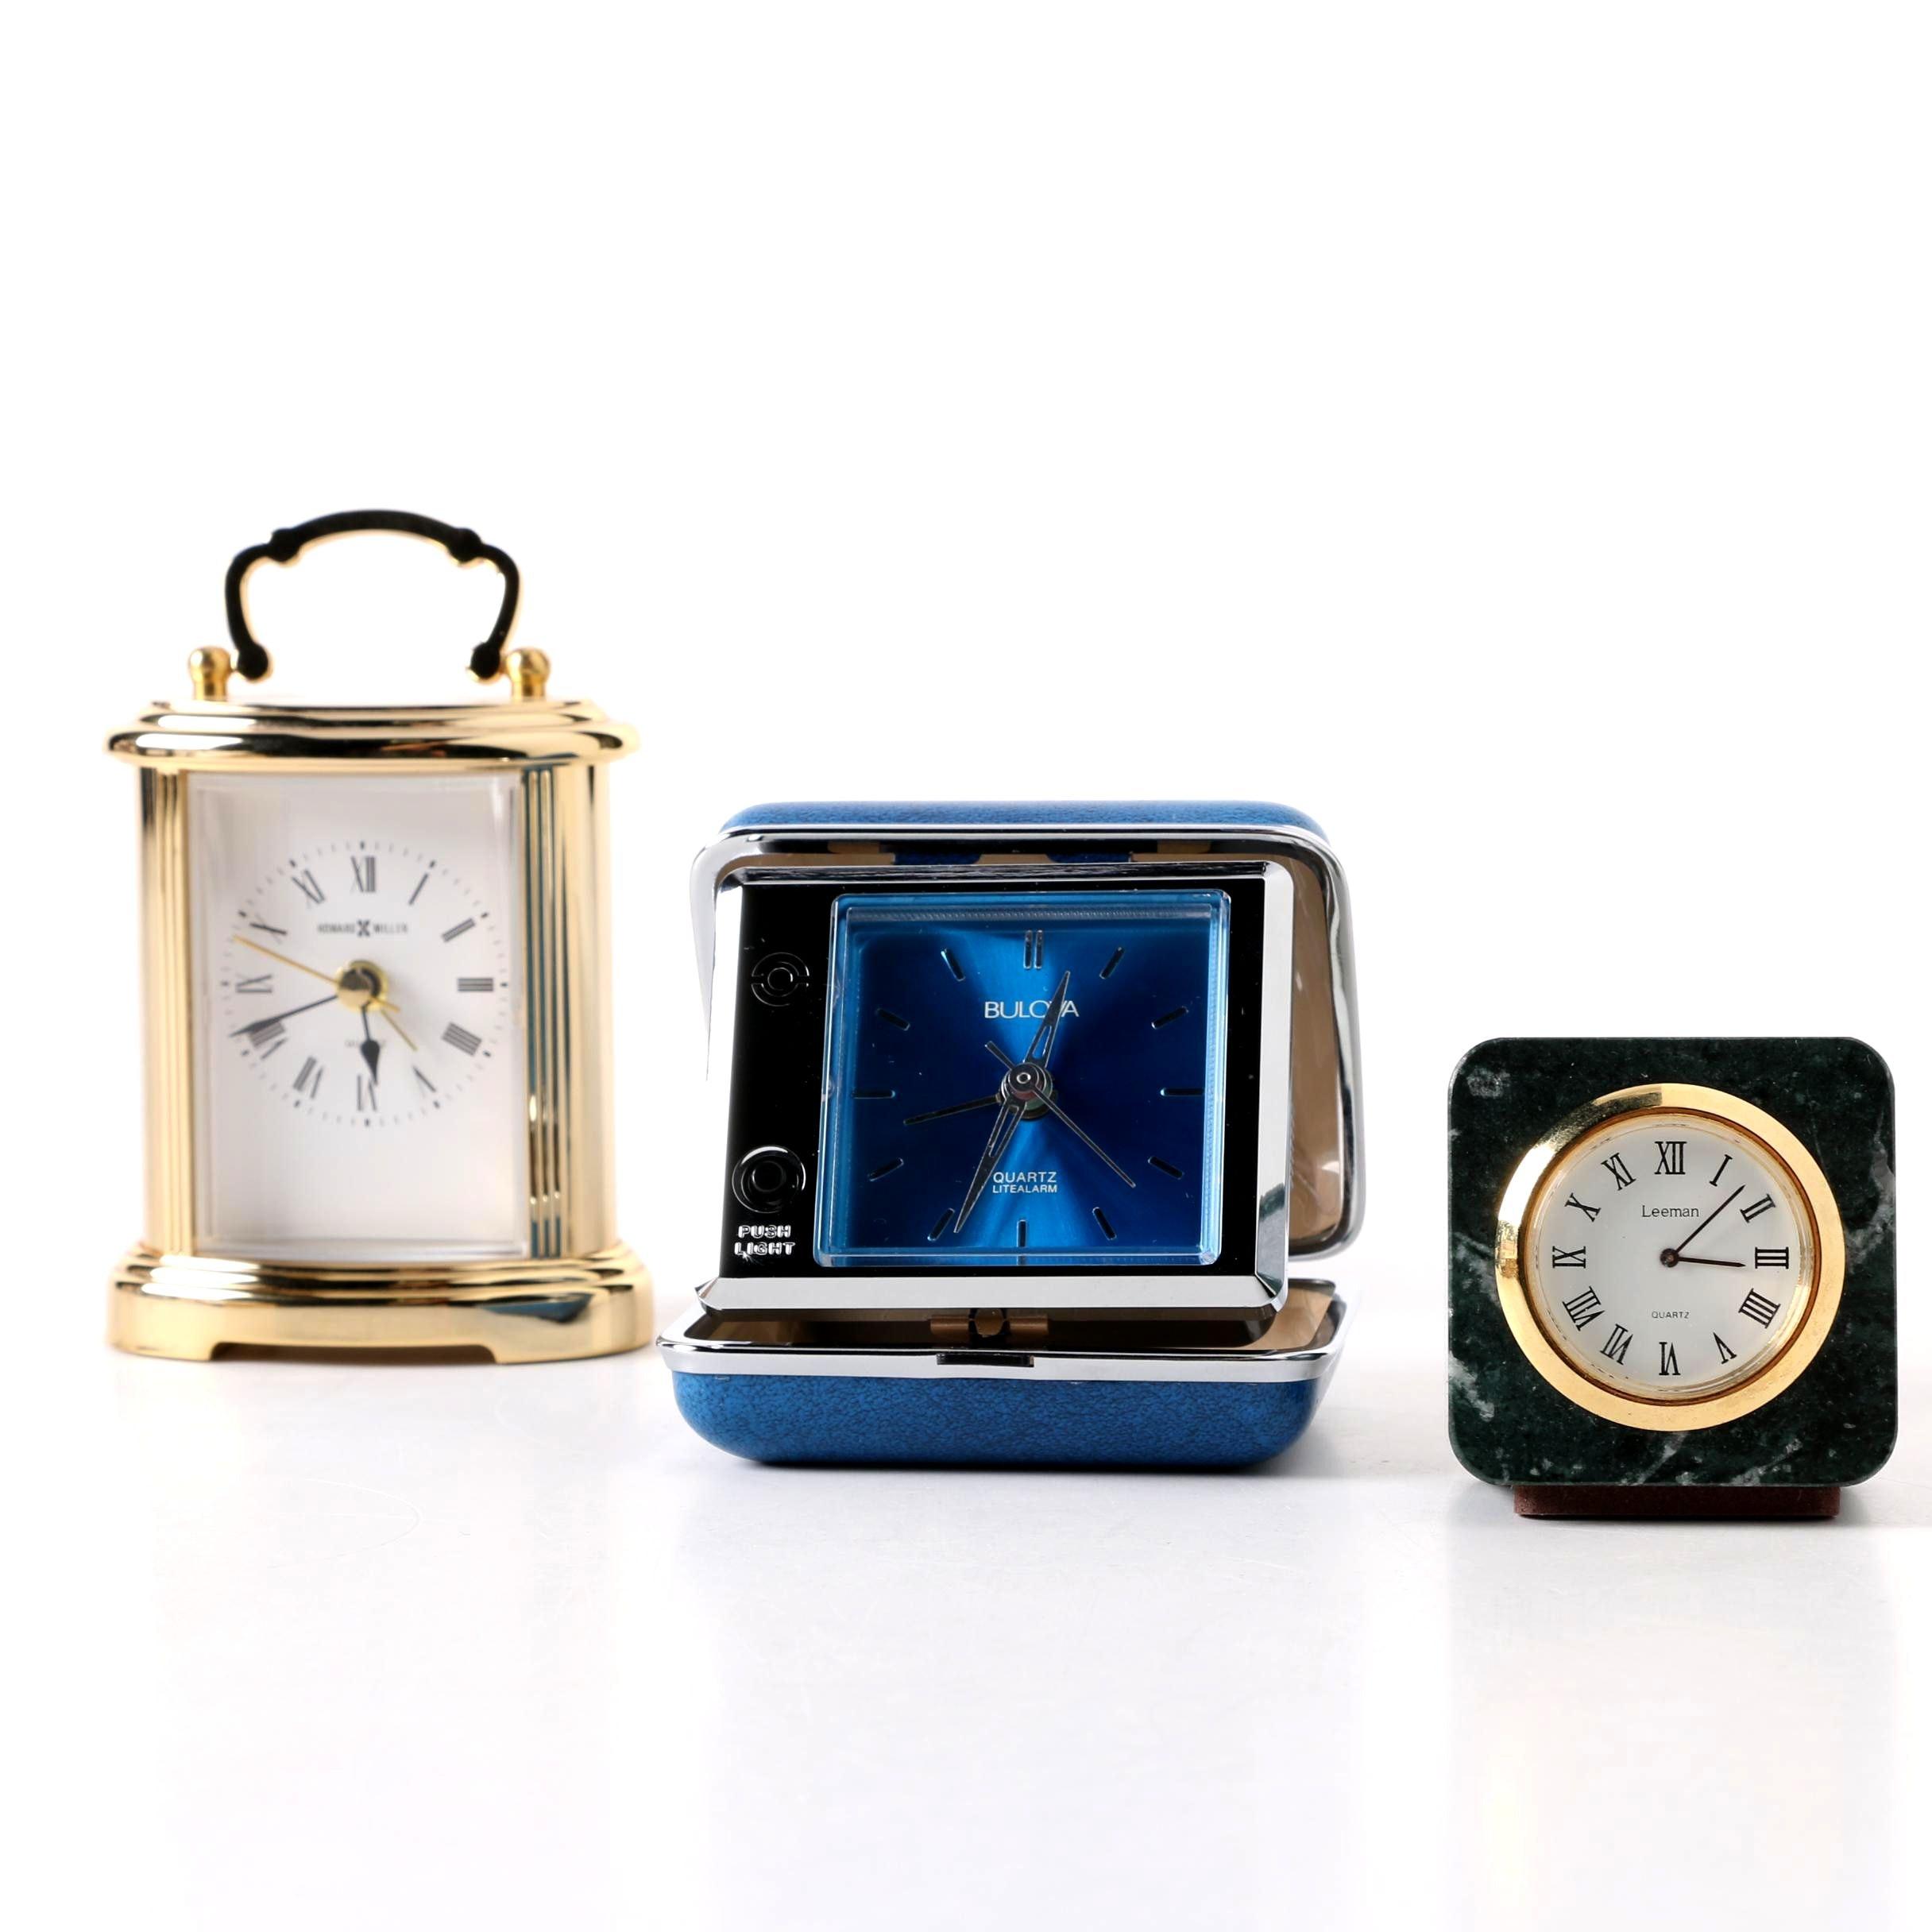 Shelf and Travel Alarm Clocks Featuring Howard Miller